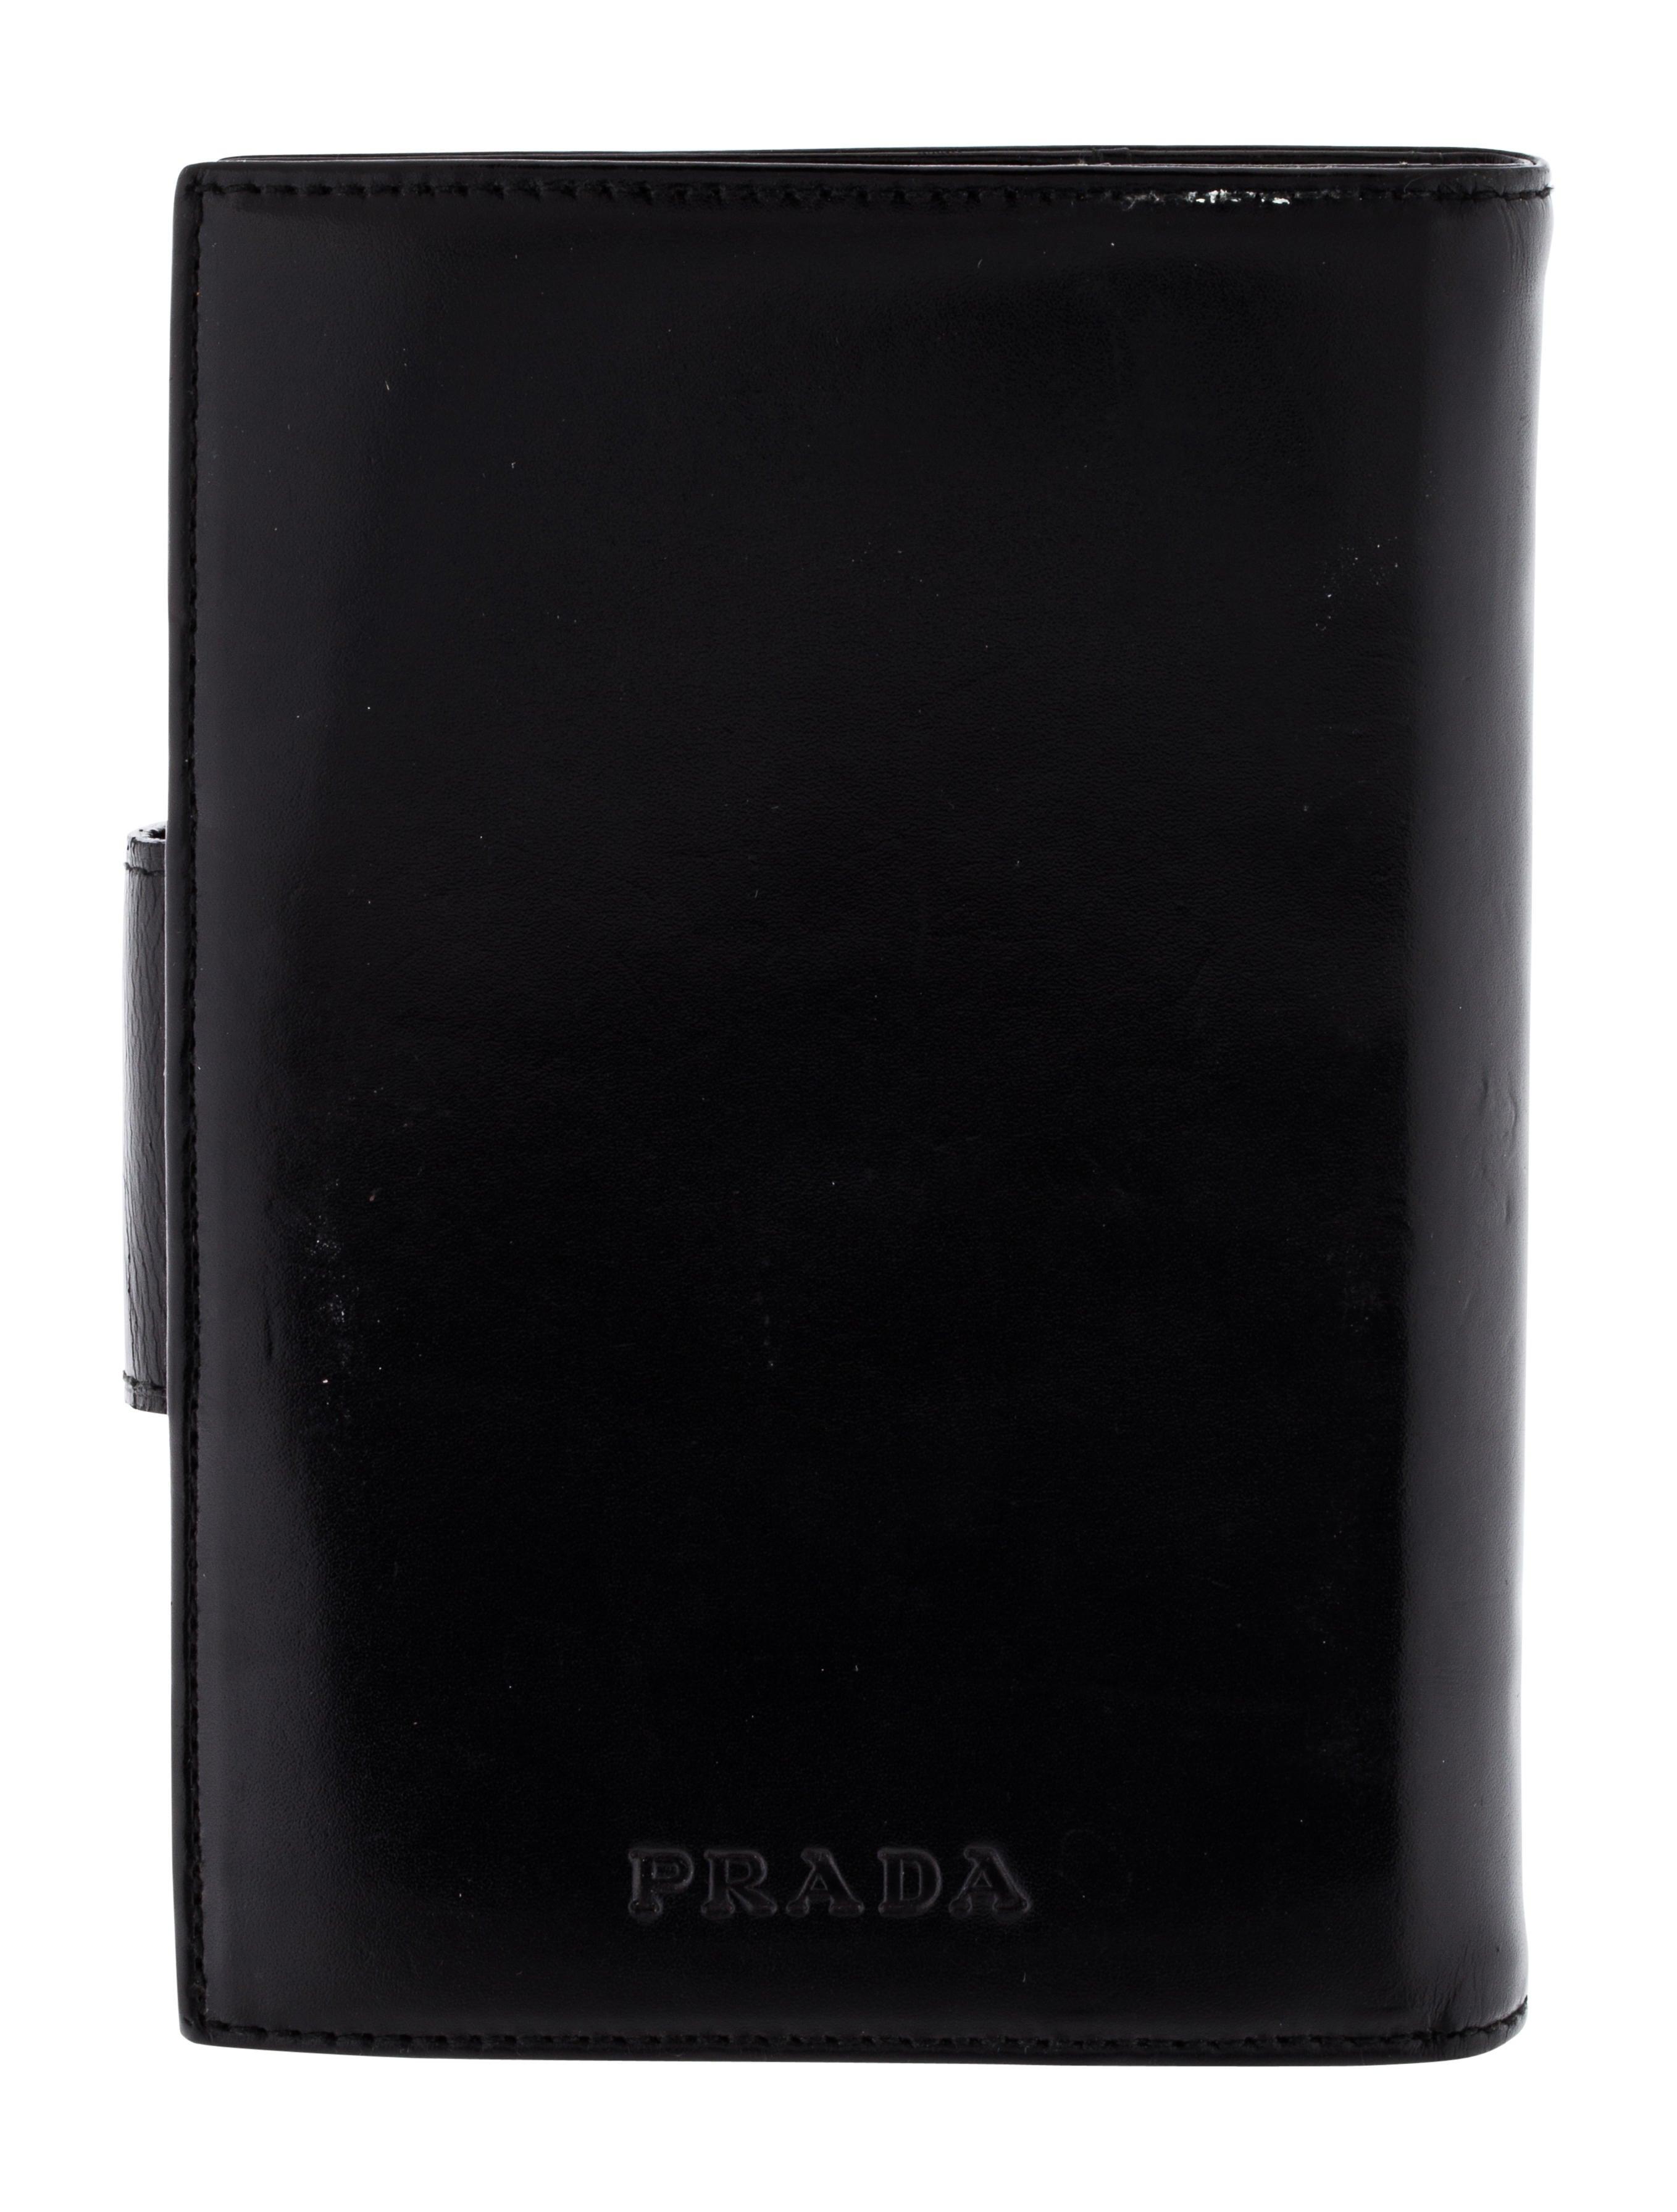 Prada Leather Planner Decor And Accessories Pra145451